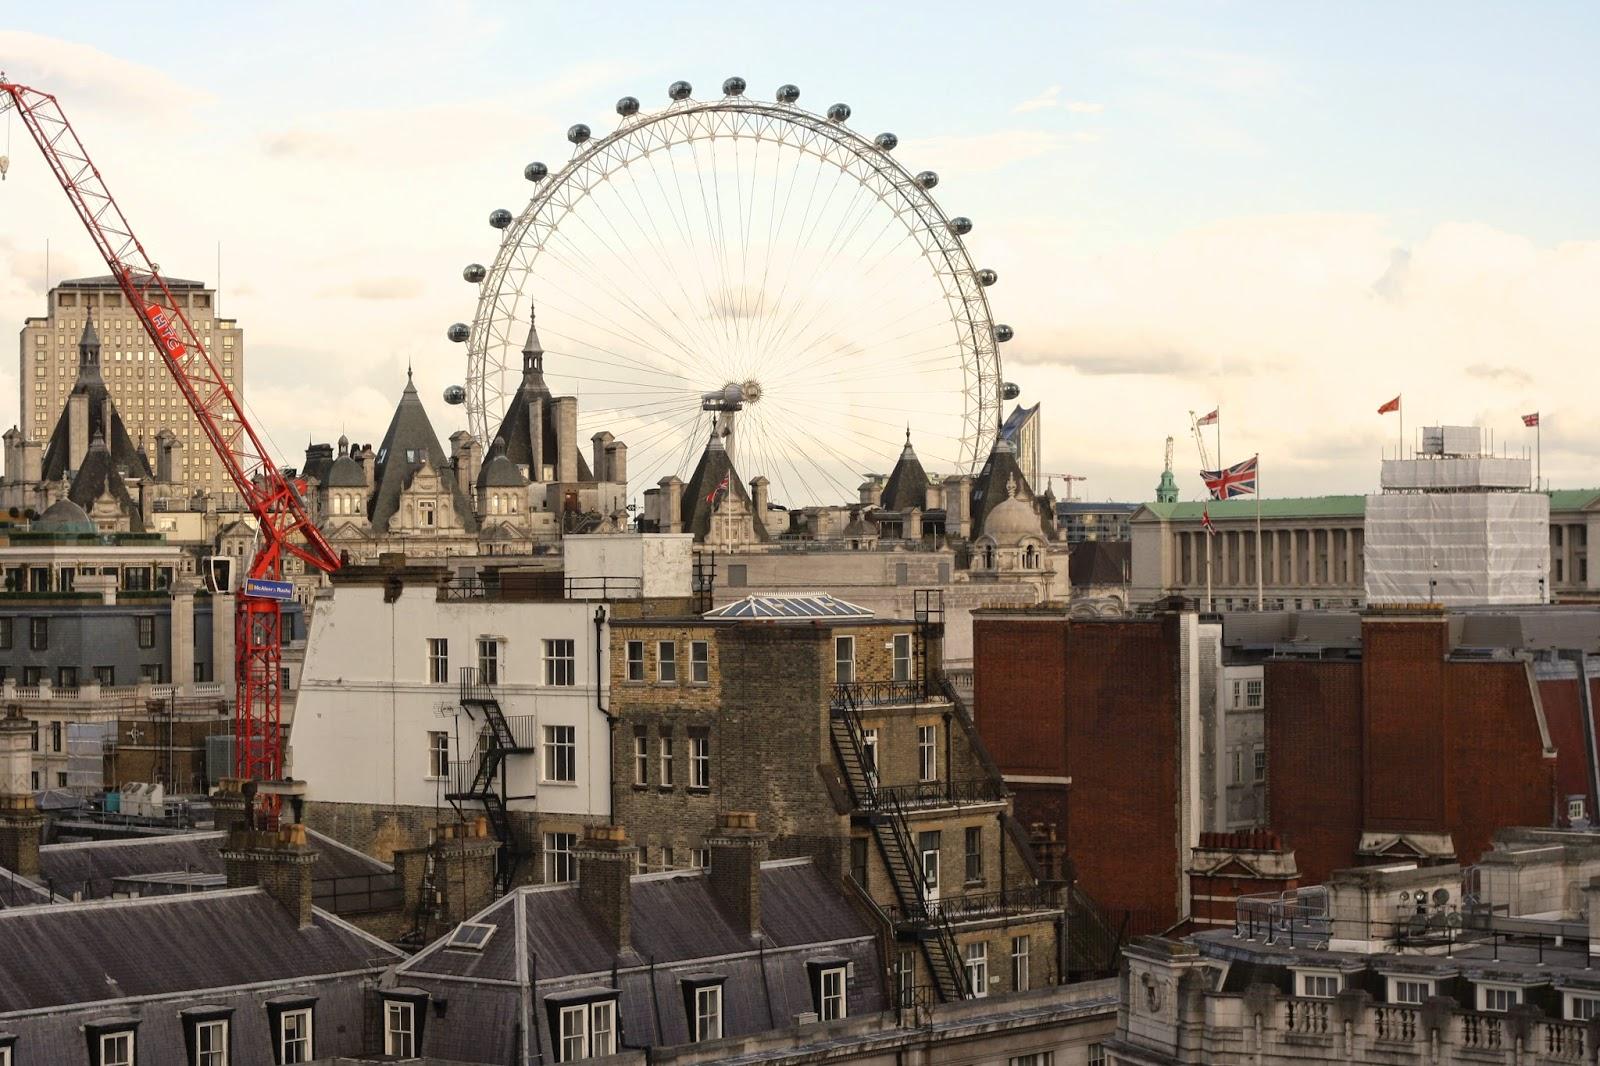 Views over Trafalgar Square London